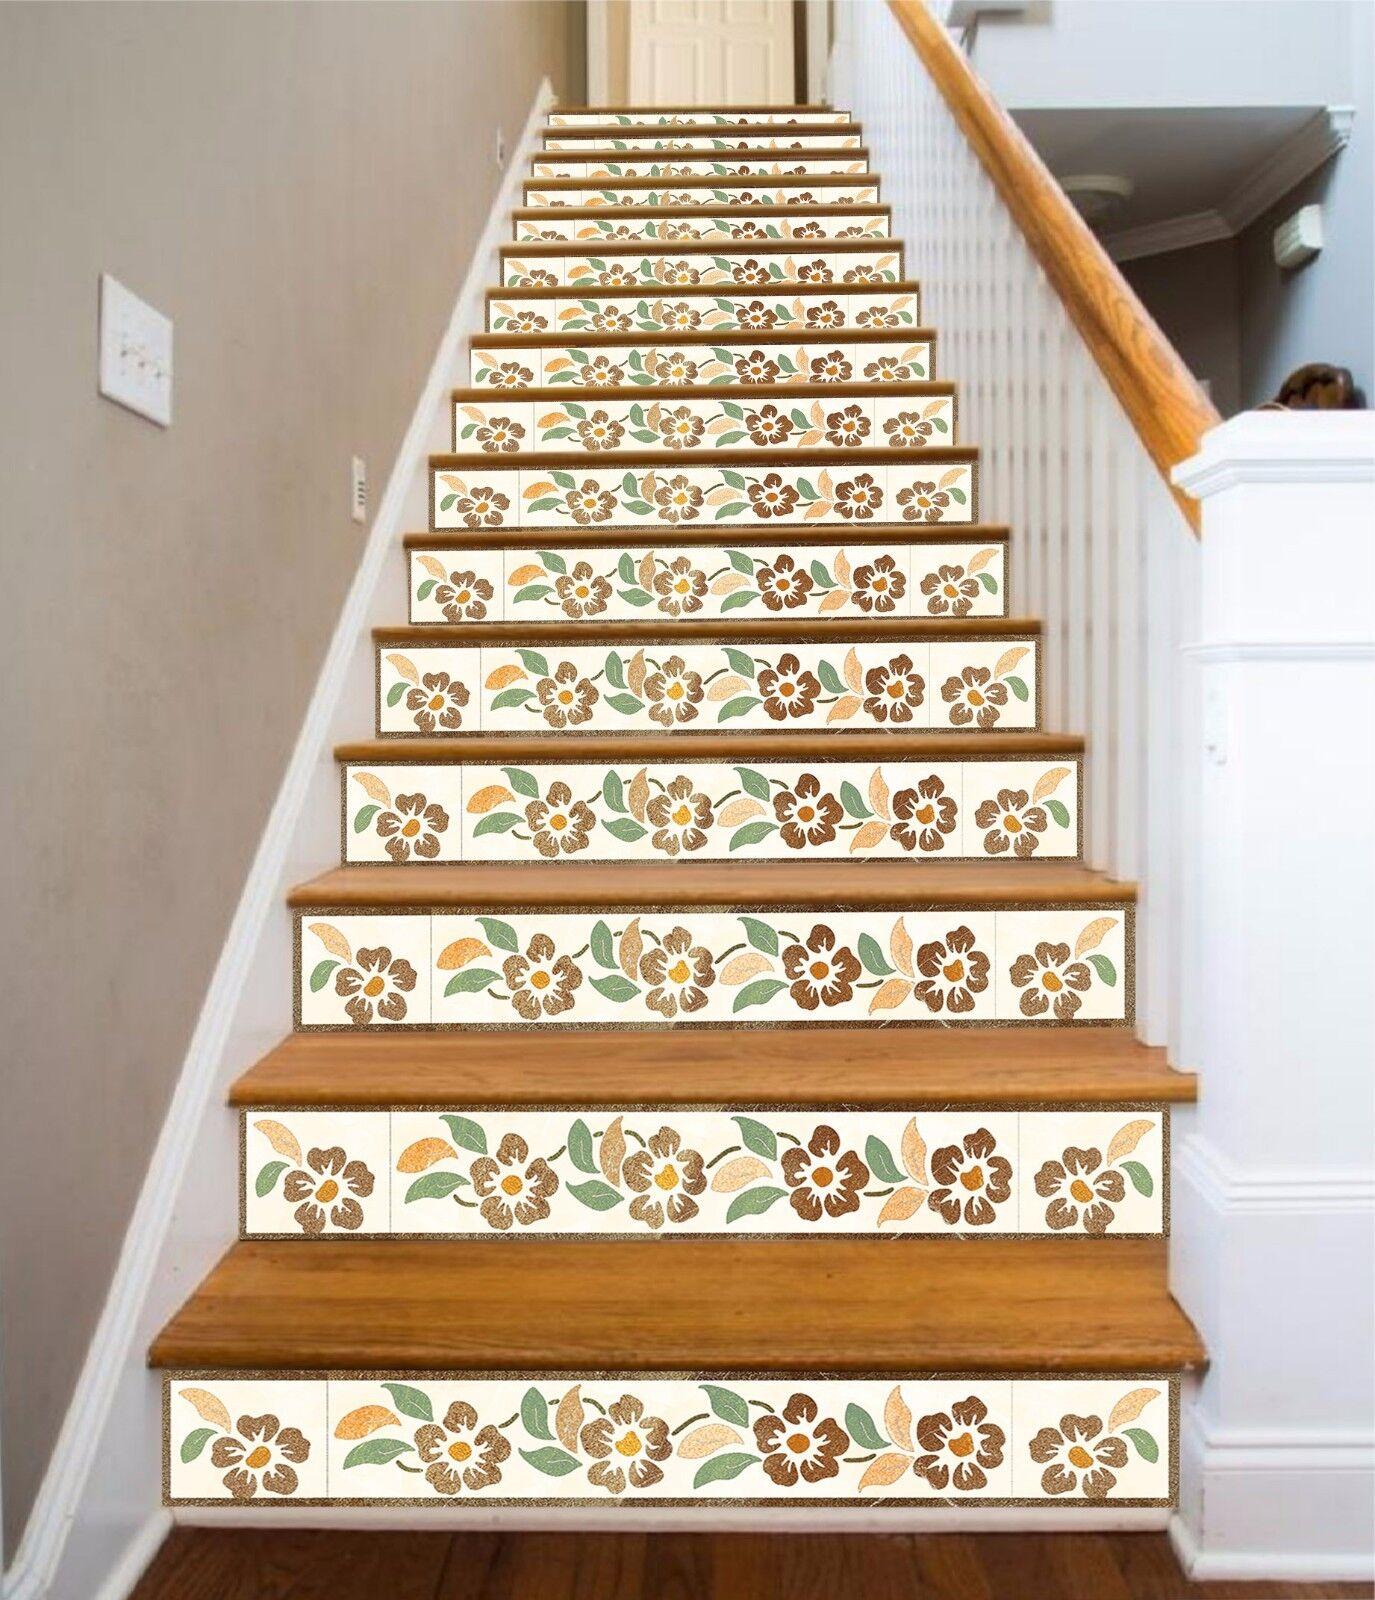 3D Petal 446 Stair Risers Decoration Photo Mural Vinyl Decal WandPapier UK Lemon